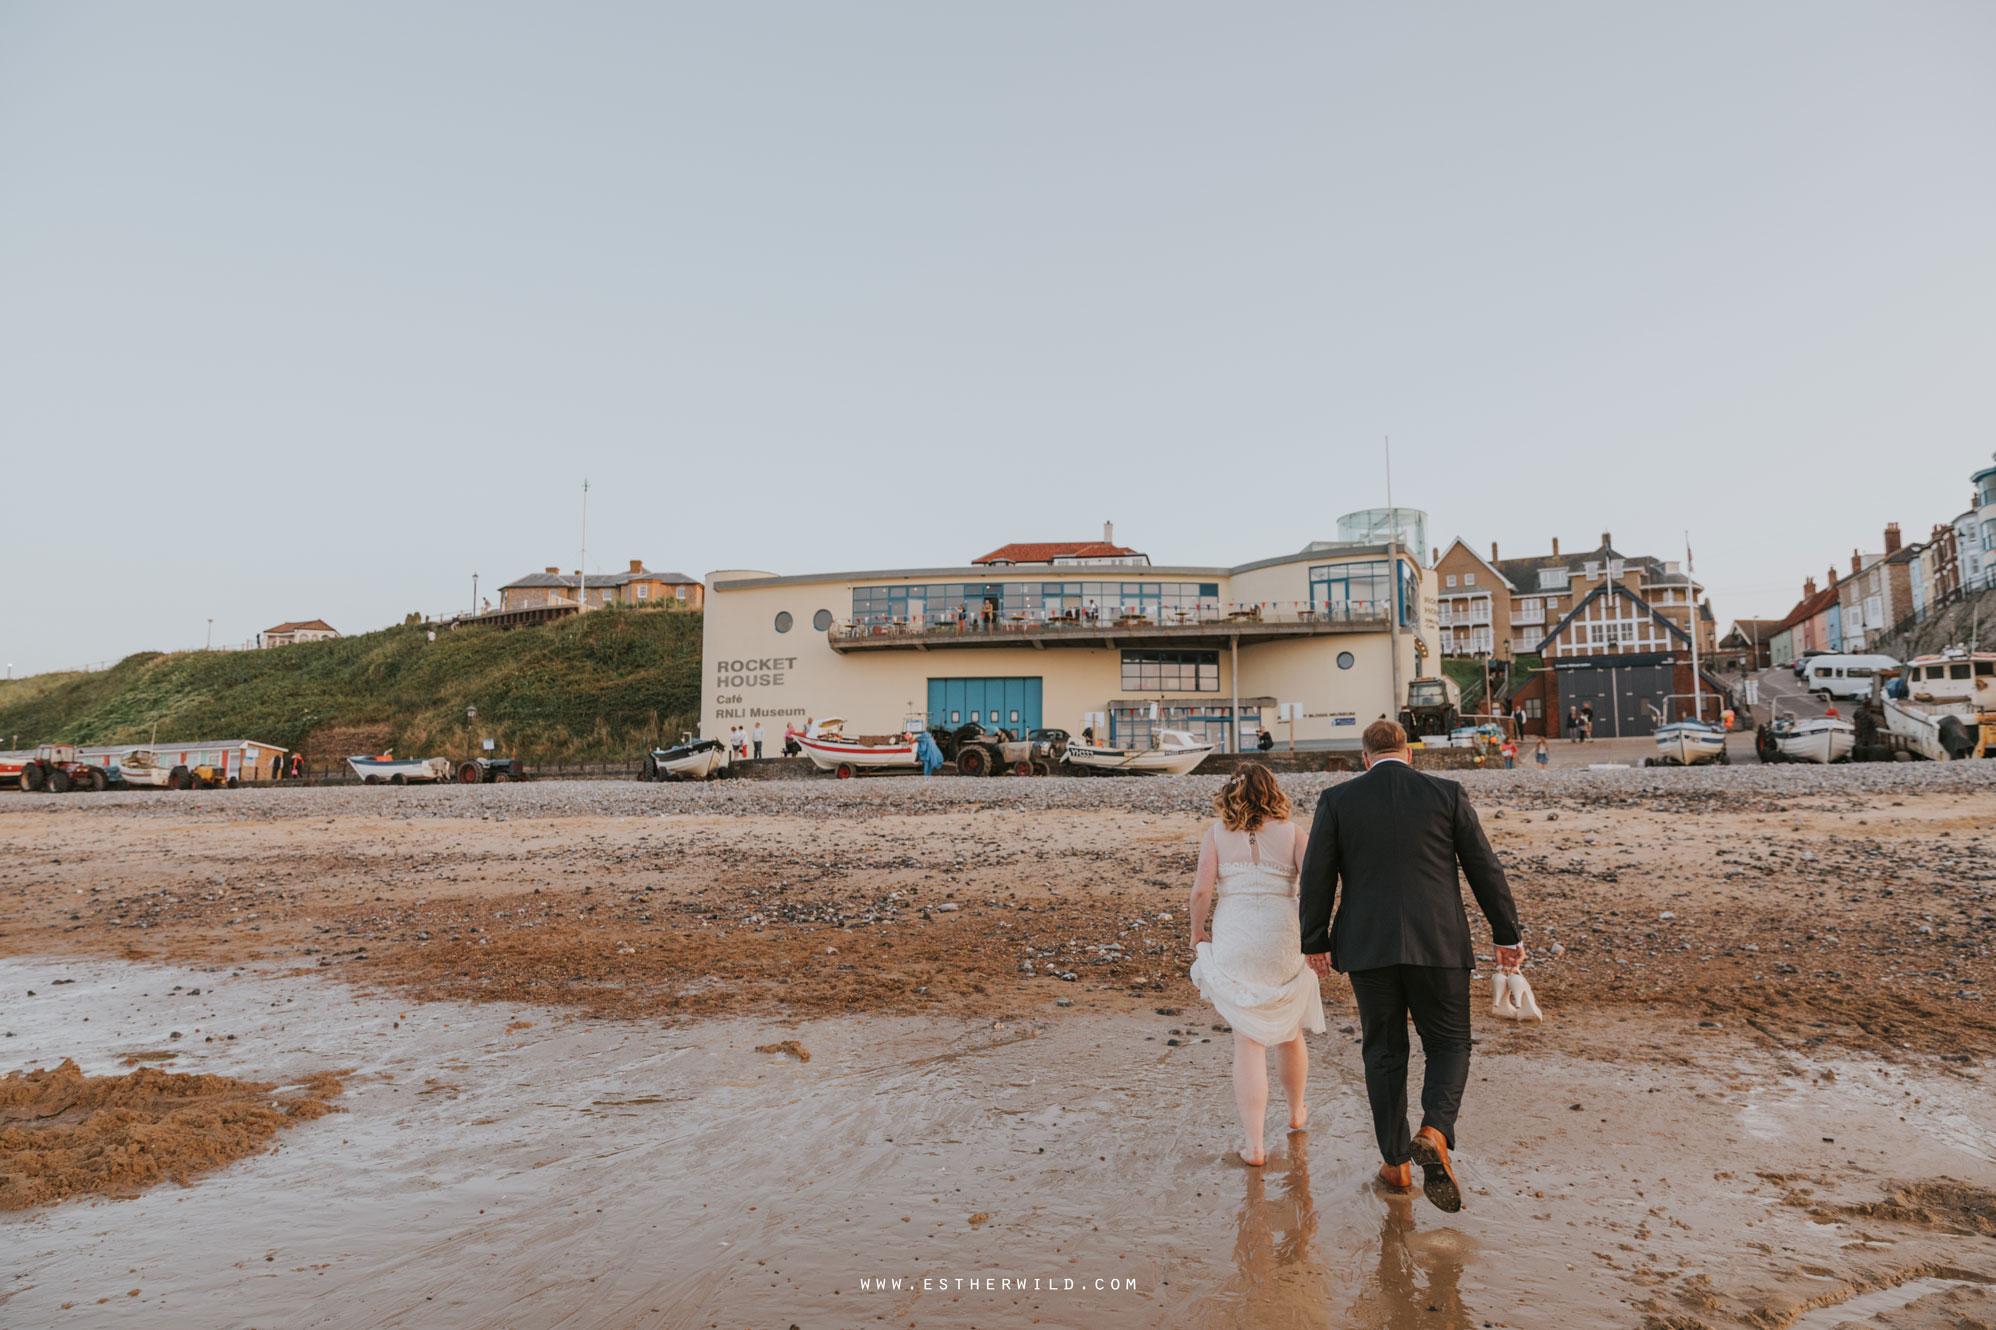 Cromer_Wedding_Beach_Outdoor_Ceremony_Norfolk_North_Lodge_Registry_Office_Rocket_House_Cafe_Cromer_Pier_IMG_5071.jpg